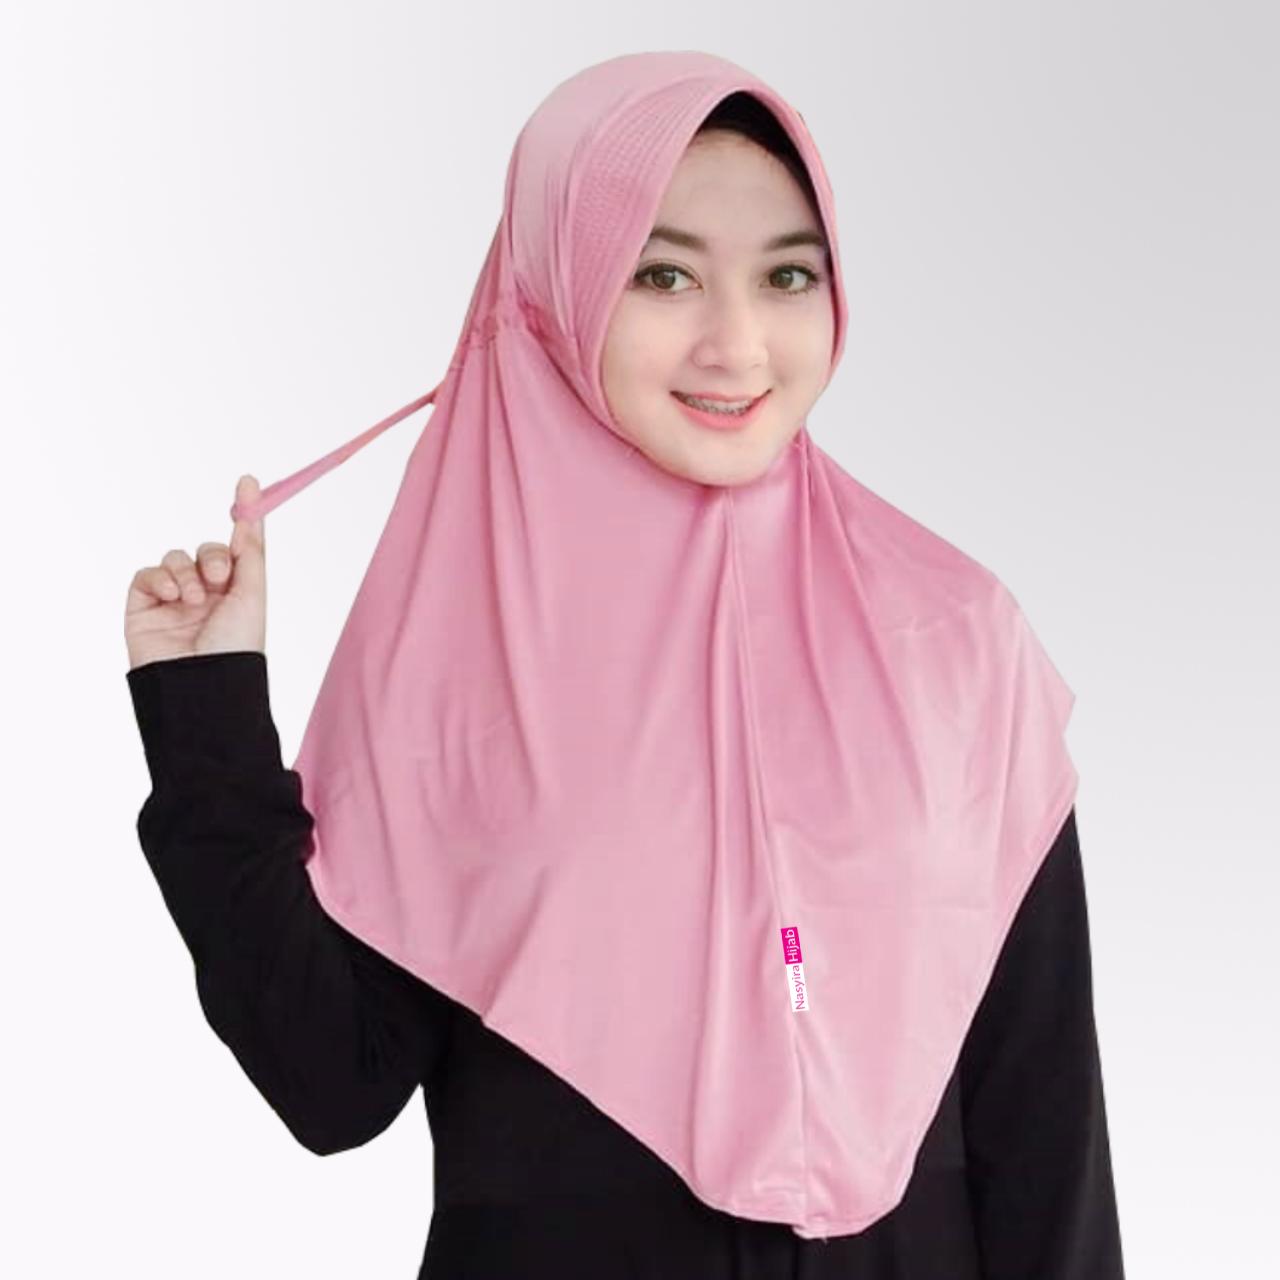 Bergo Tali Serut Sekolah Hijab Serut Belakang Kerudung Dewasa Tali Serut Jilbab Terlaris Laura Dewasa Lazada Indonesia